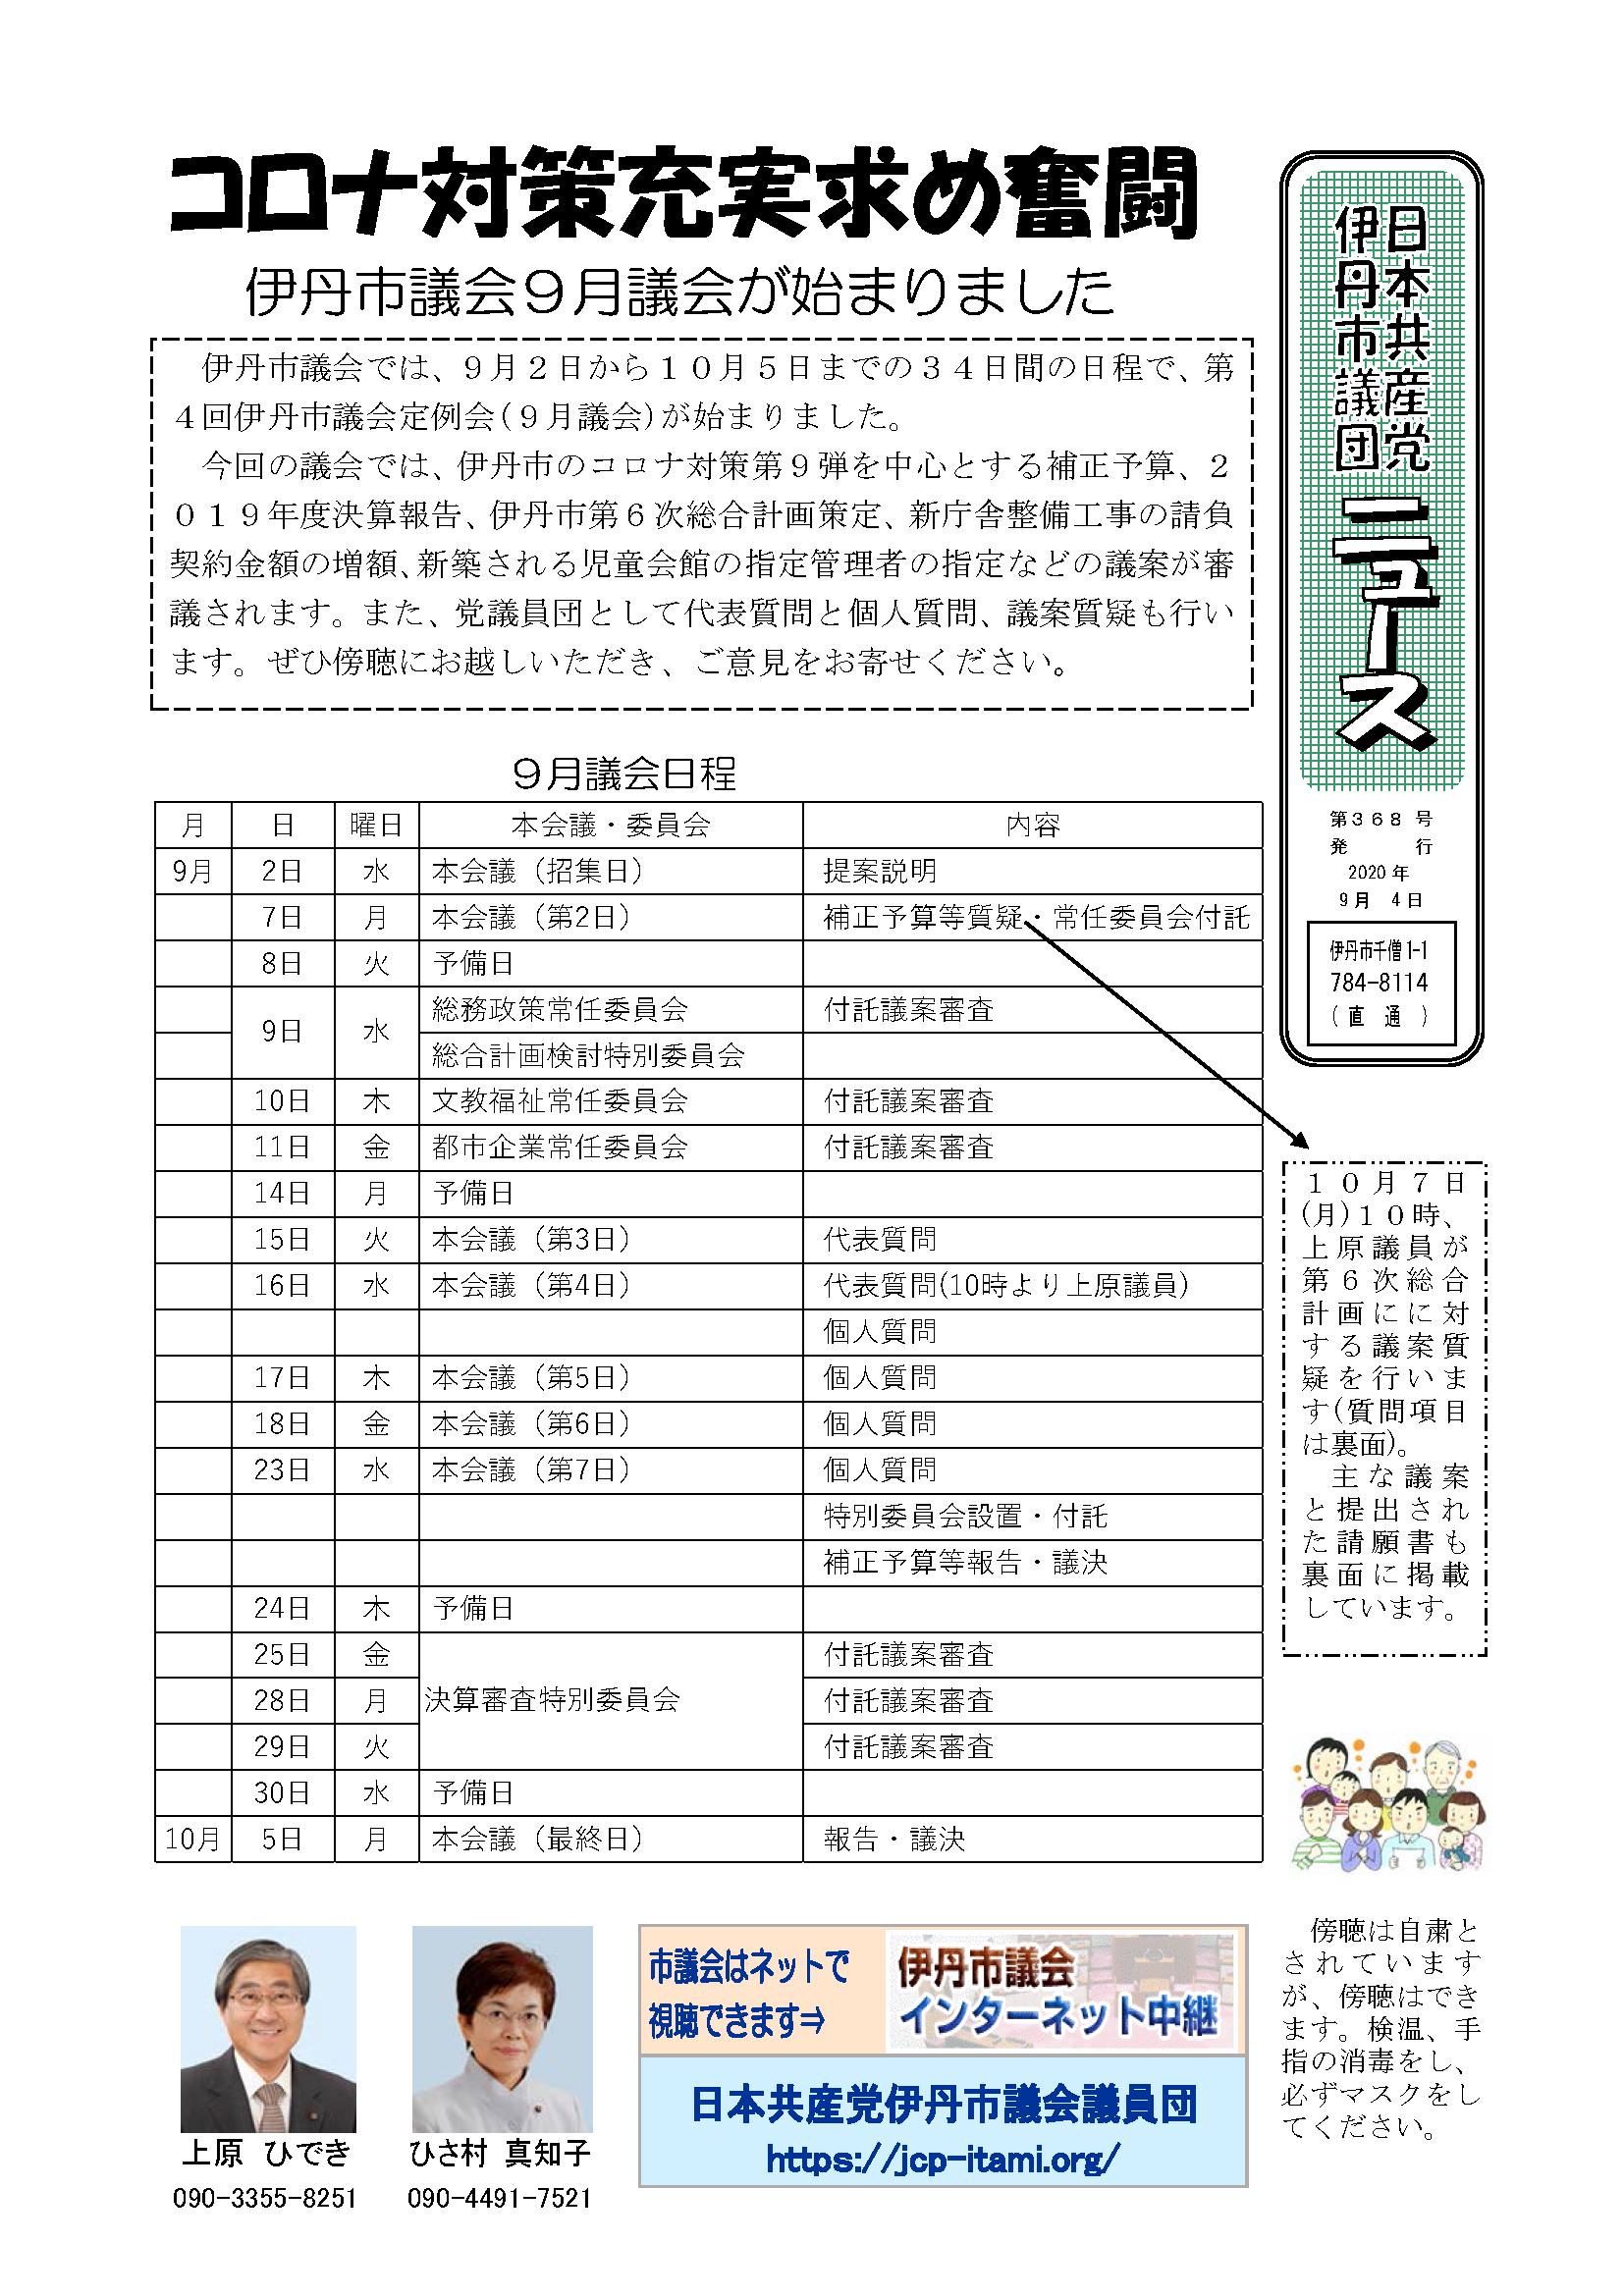 日本共産党伊丹市議団ニュース368号1面